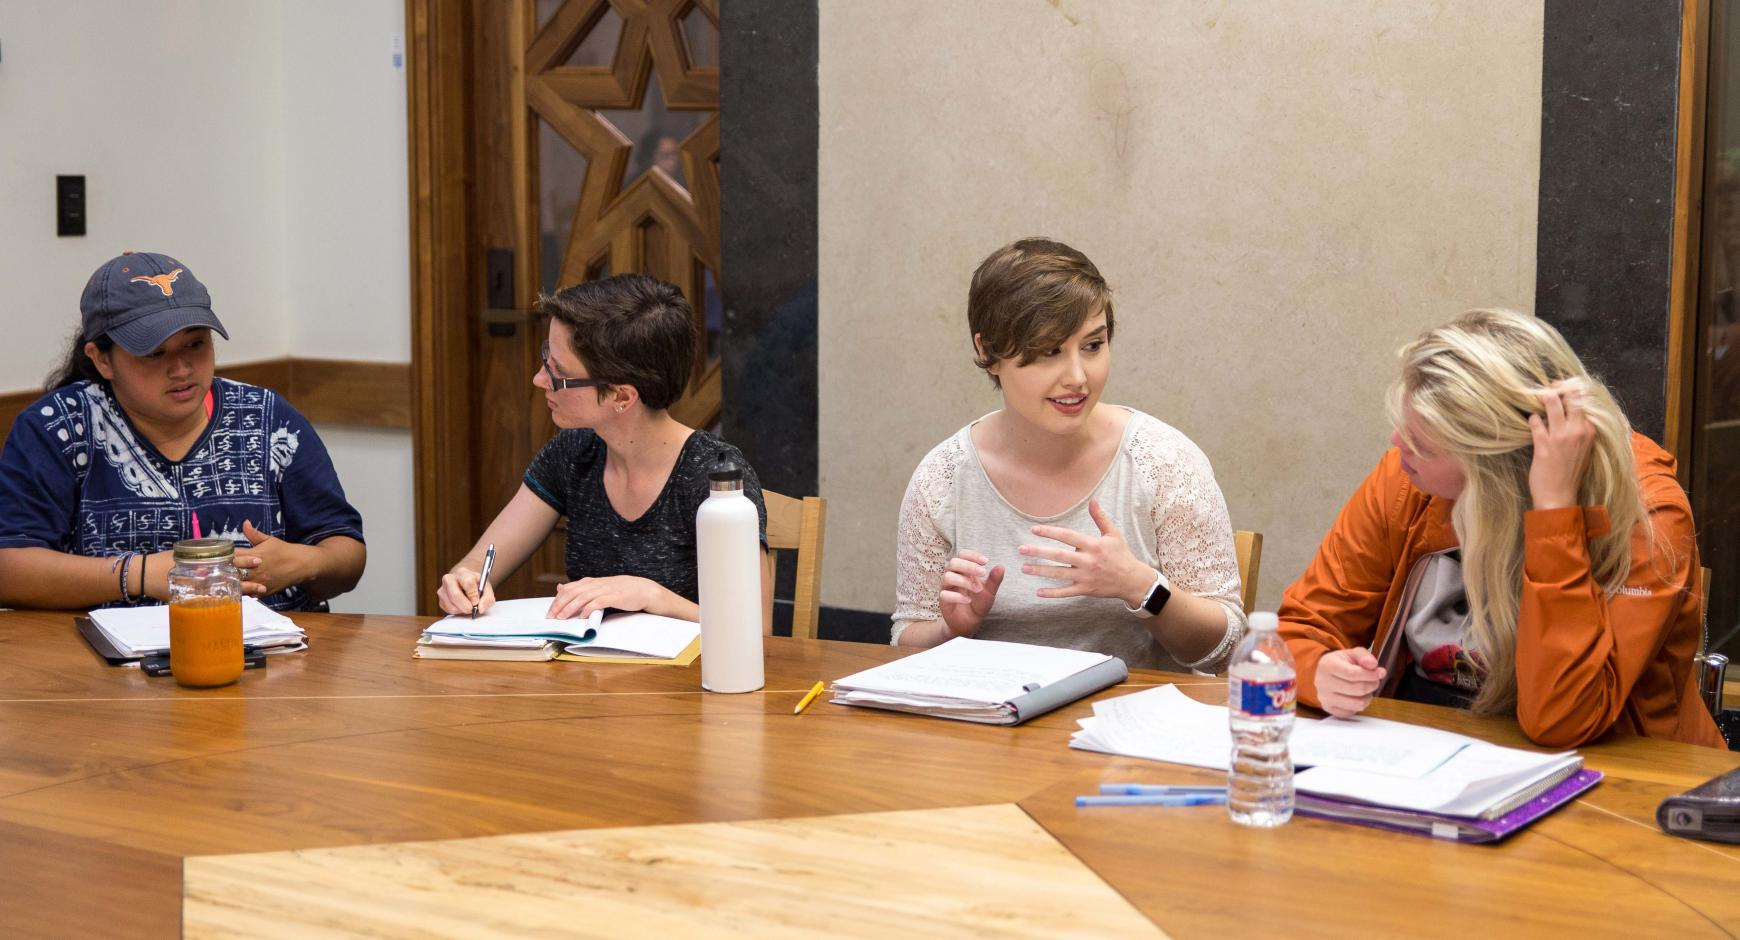 Students at the School of Undergraduate Studies